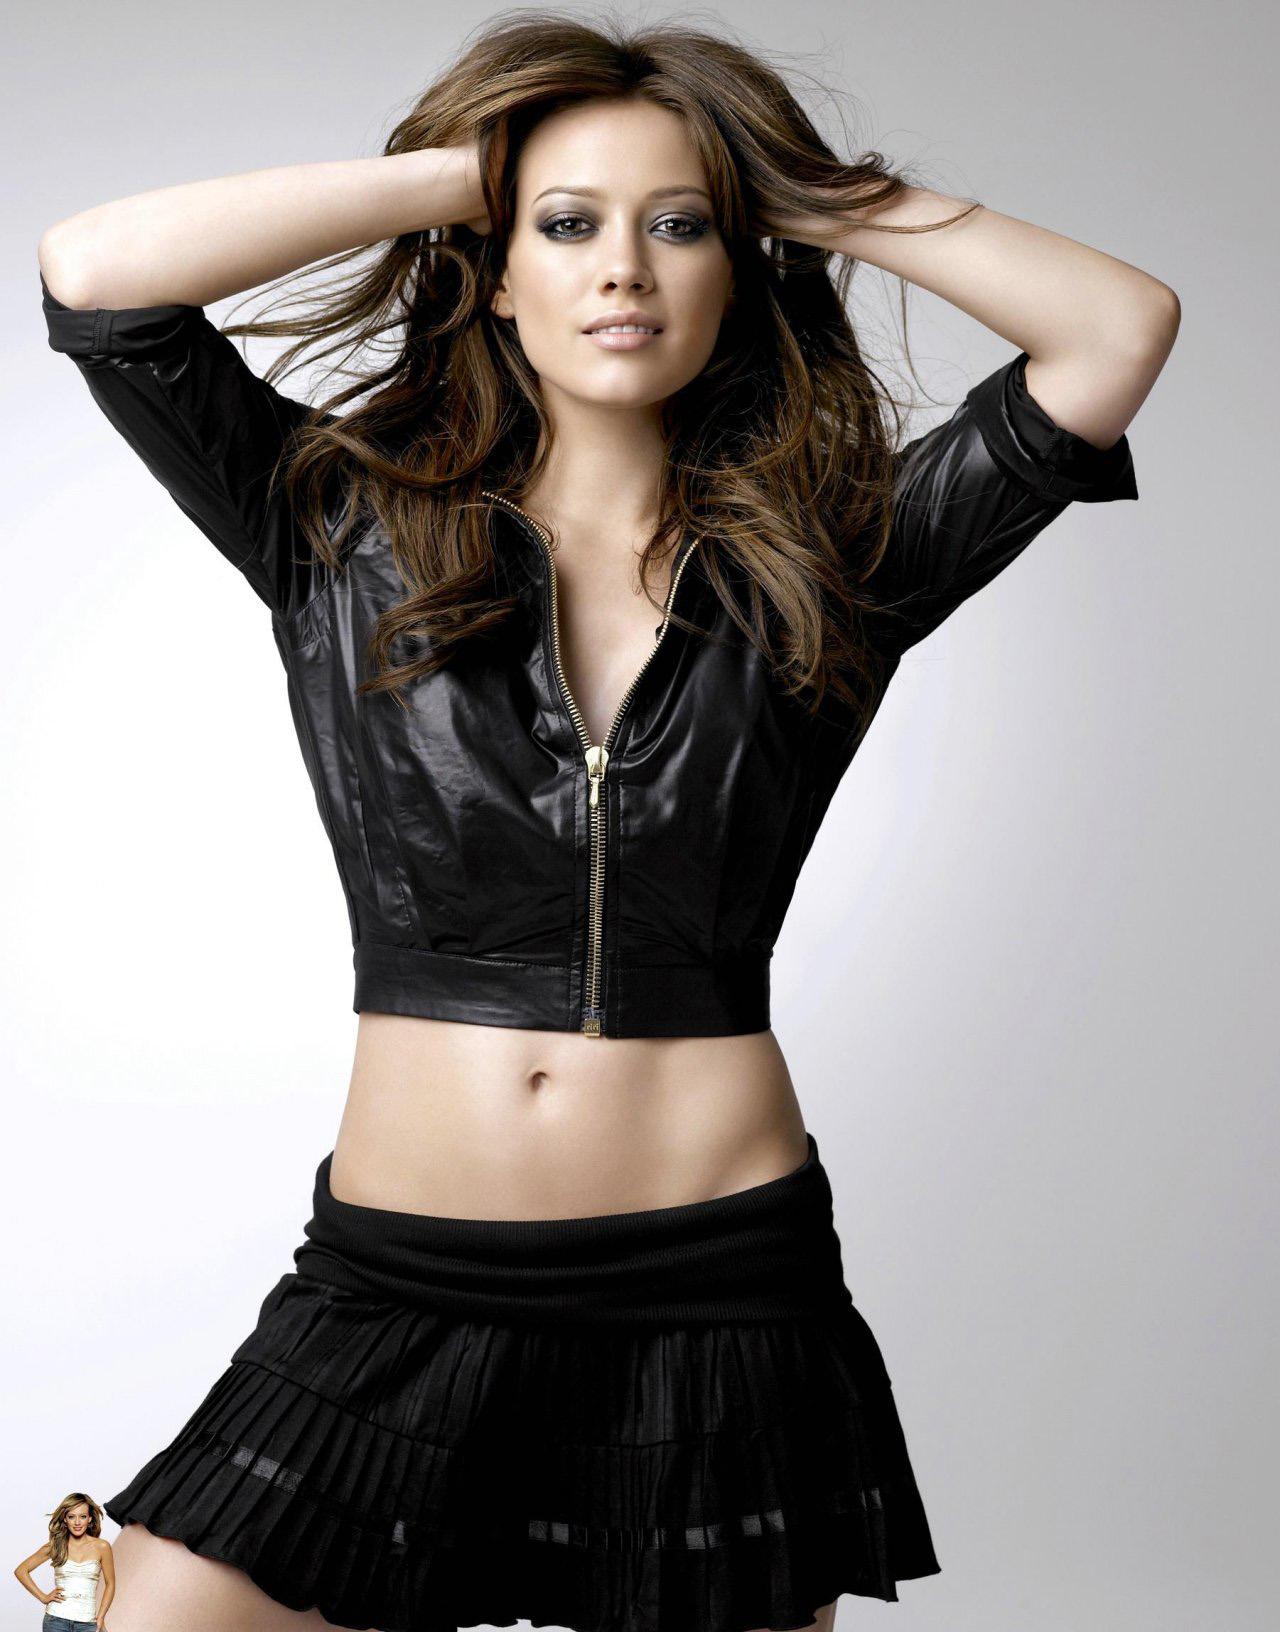 Hilary Duff Hot Picture